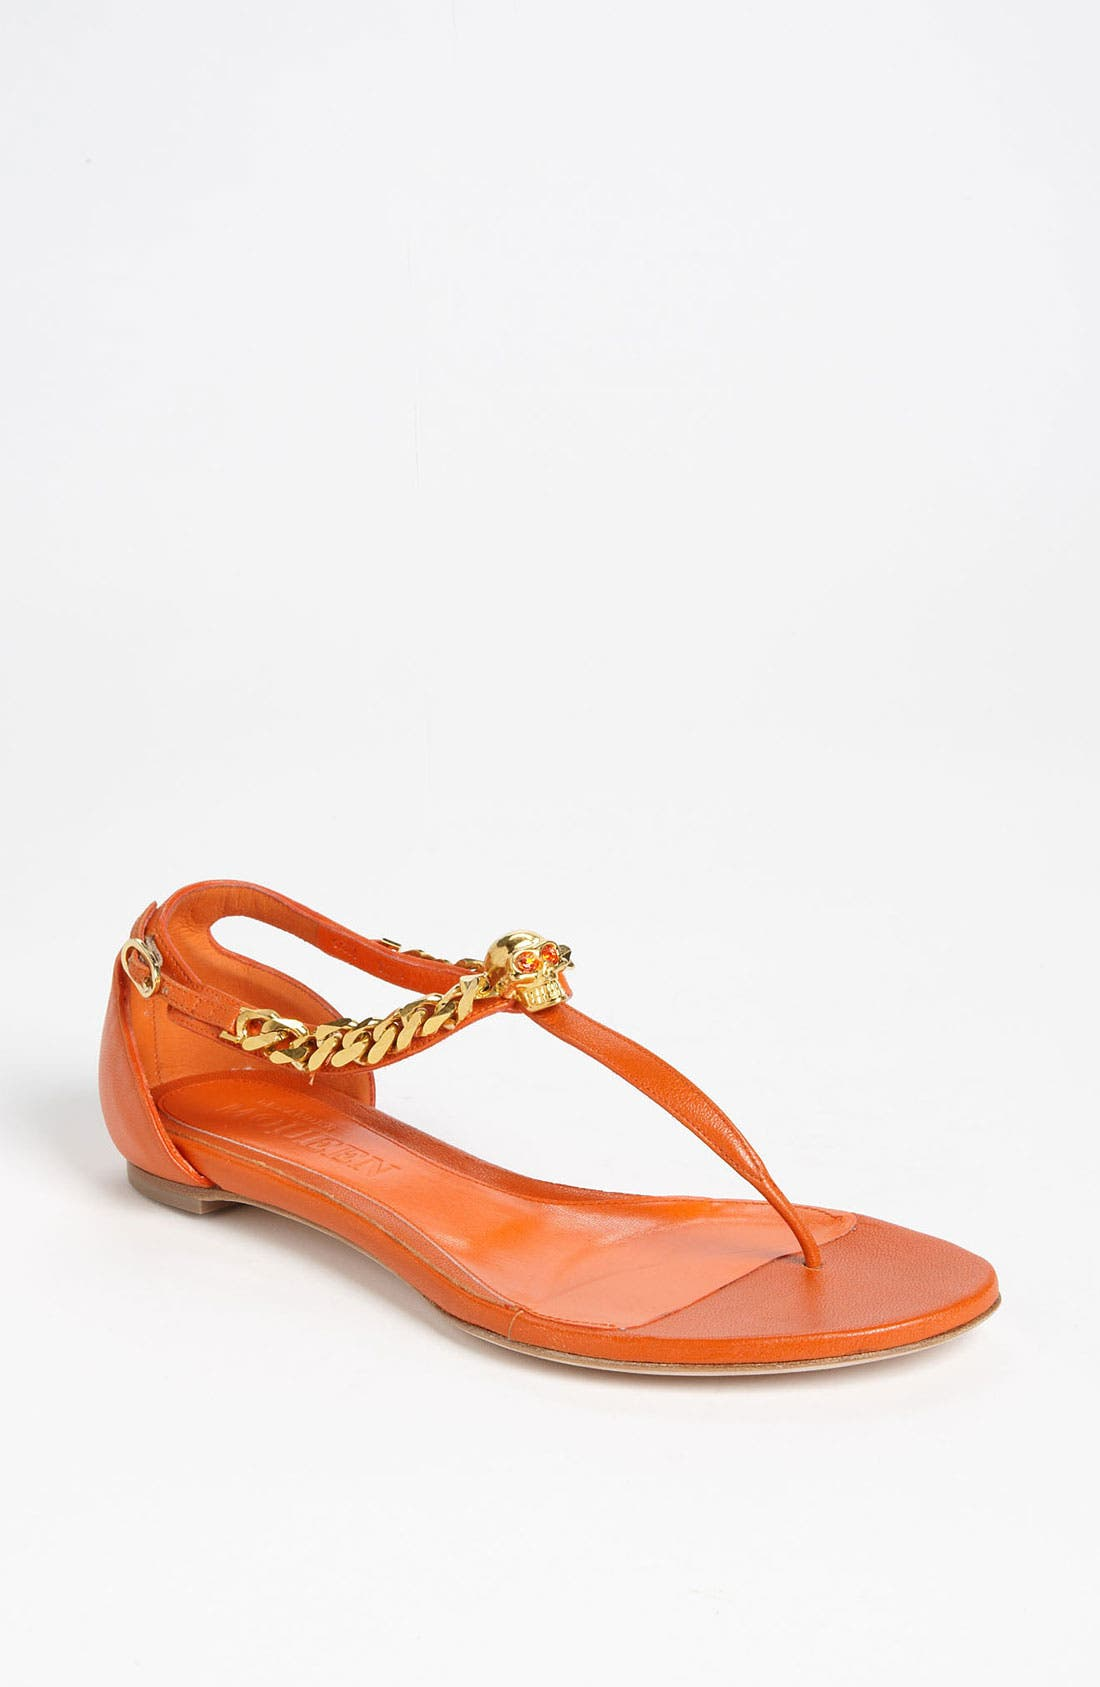 Alternate Image 1 Selected - Alexander McQueen Flat Sandal